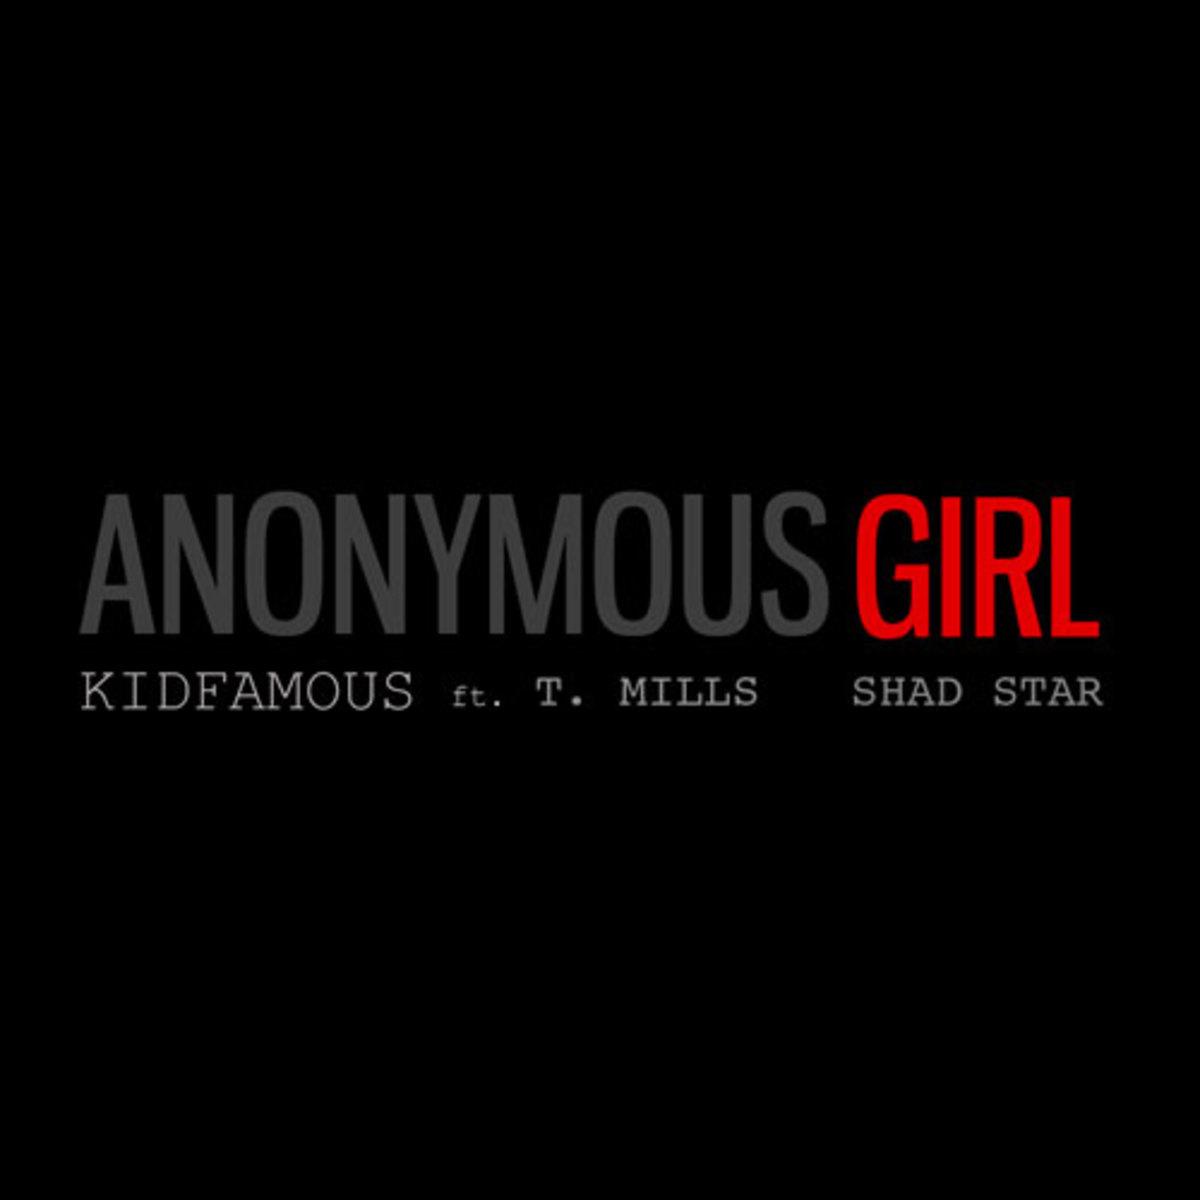 kidfamous-anonymousgirl.jpg